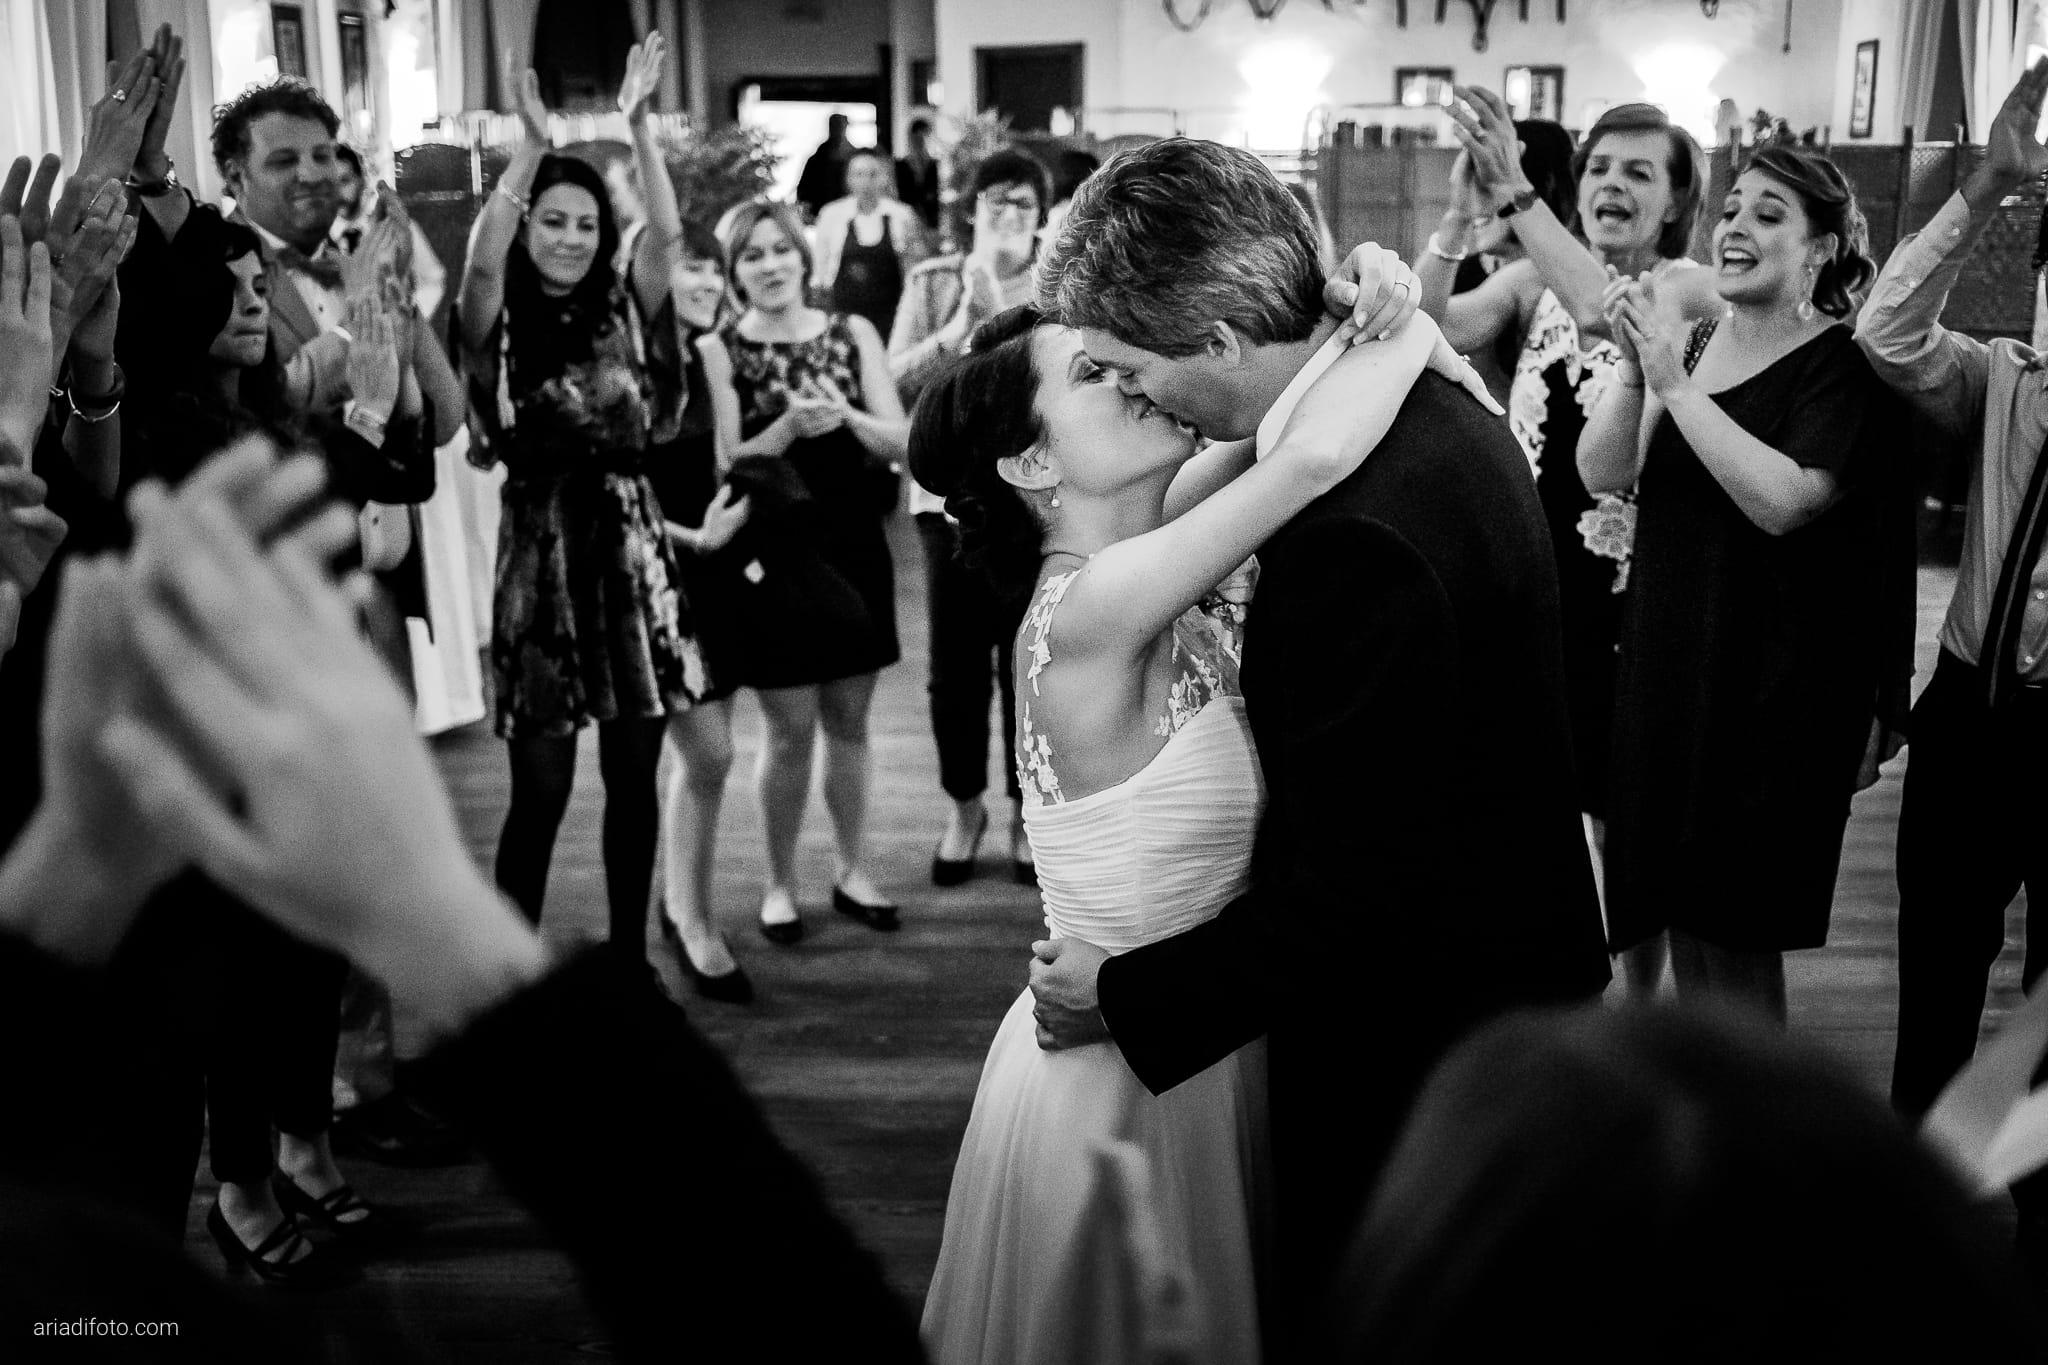 Tatiana Marco Matrimonio Trieste Baronesse Tacco San Floriano Collio Gorizia ricevimento primo ballo